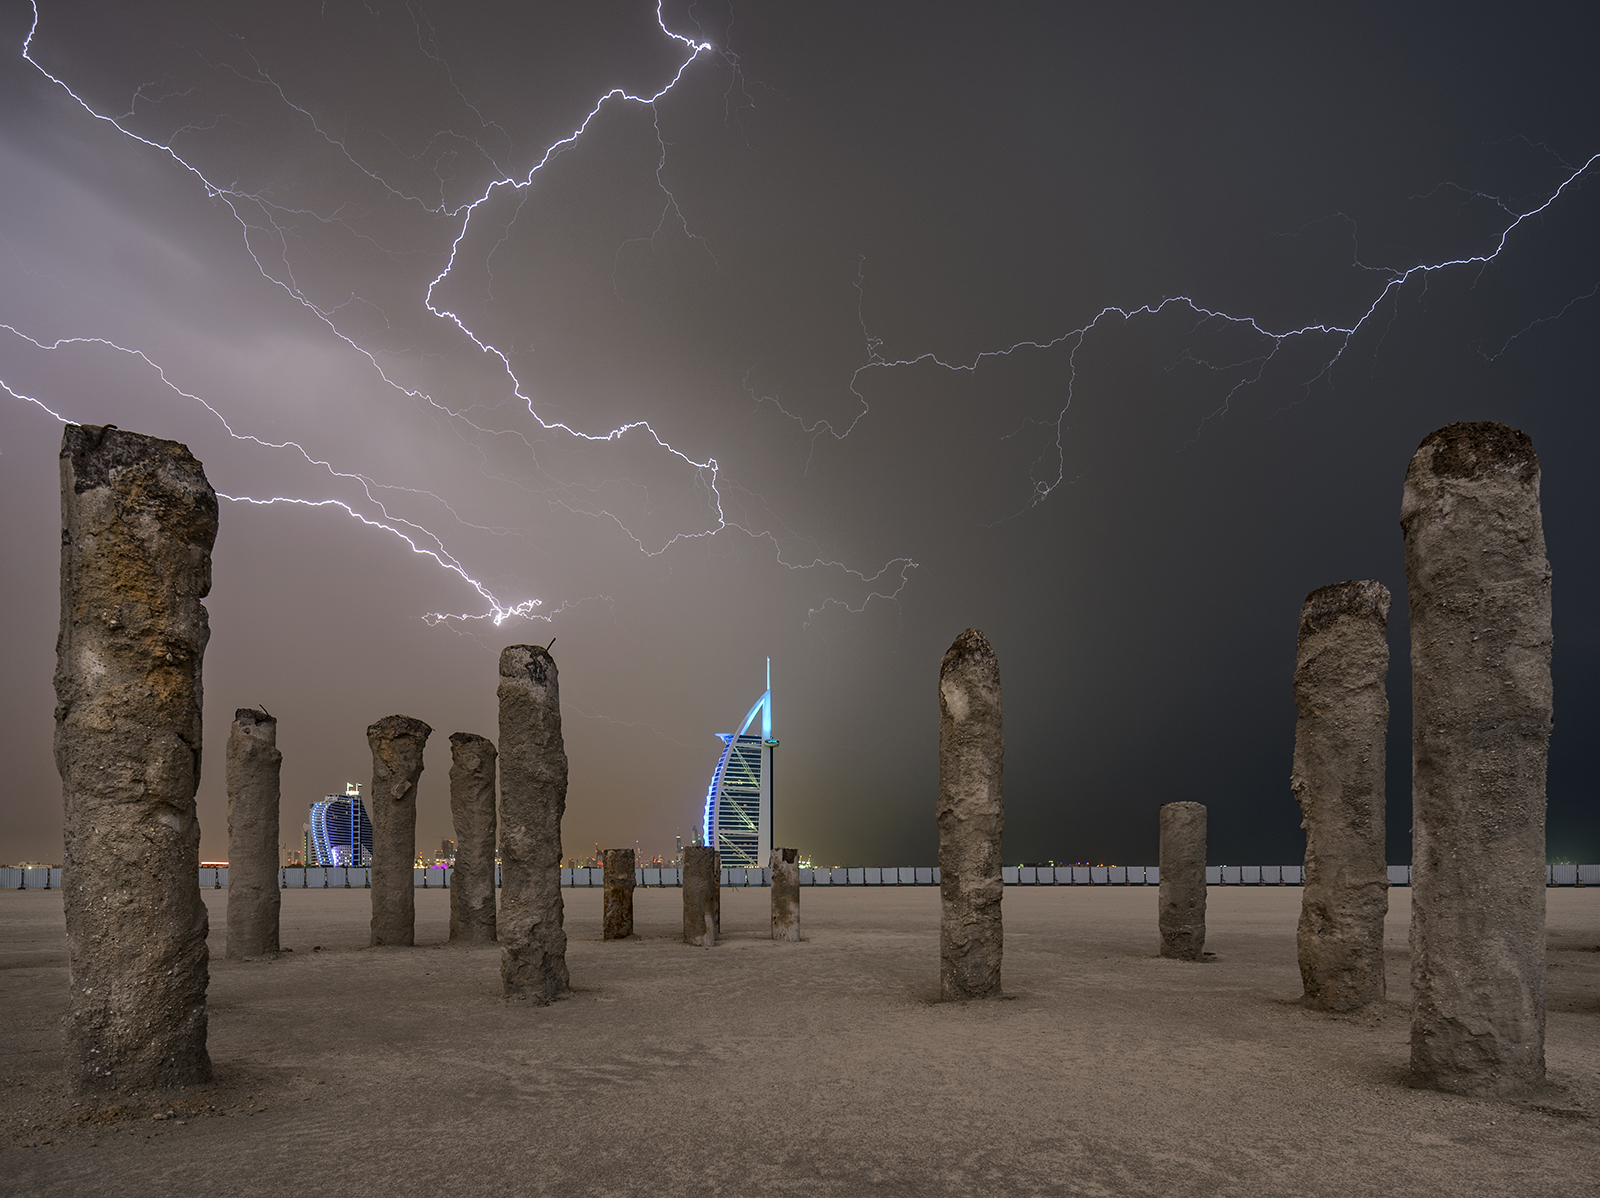 Lightning storm in Dubai